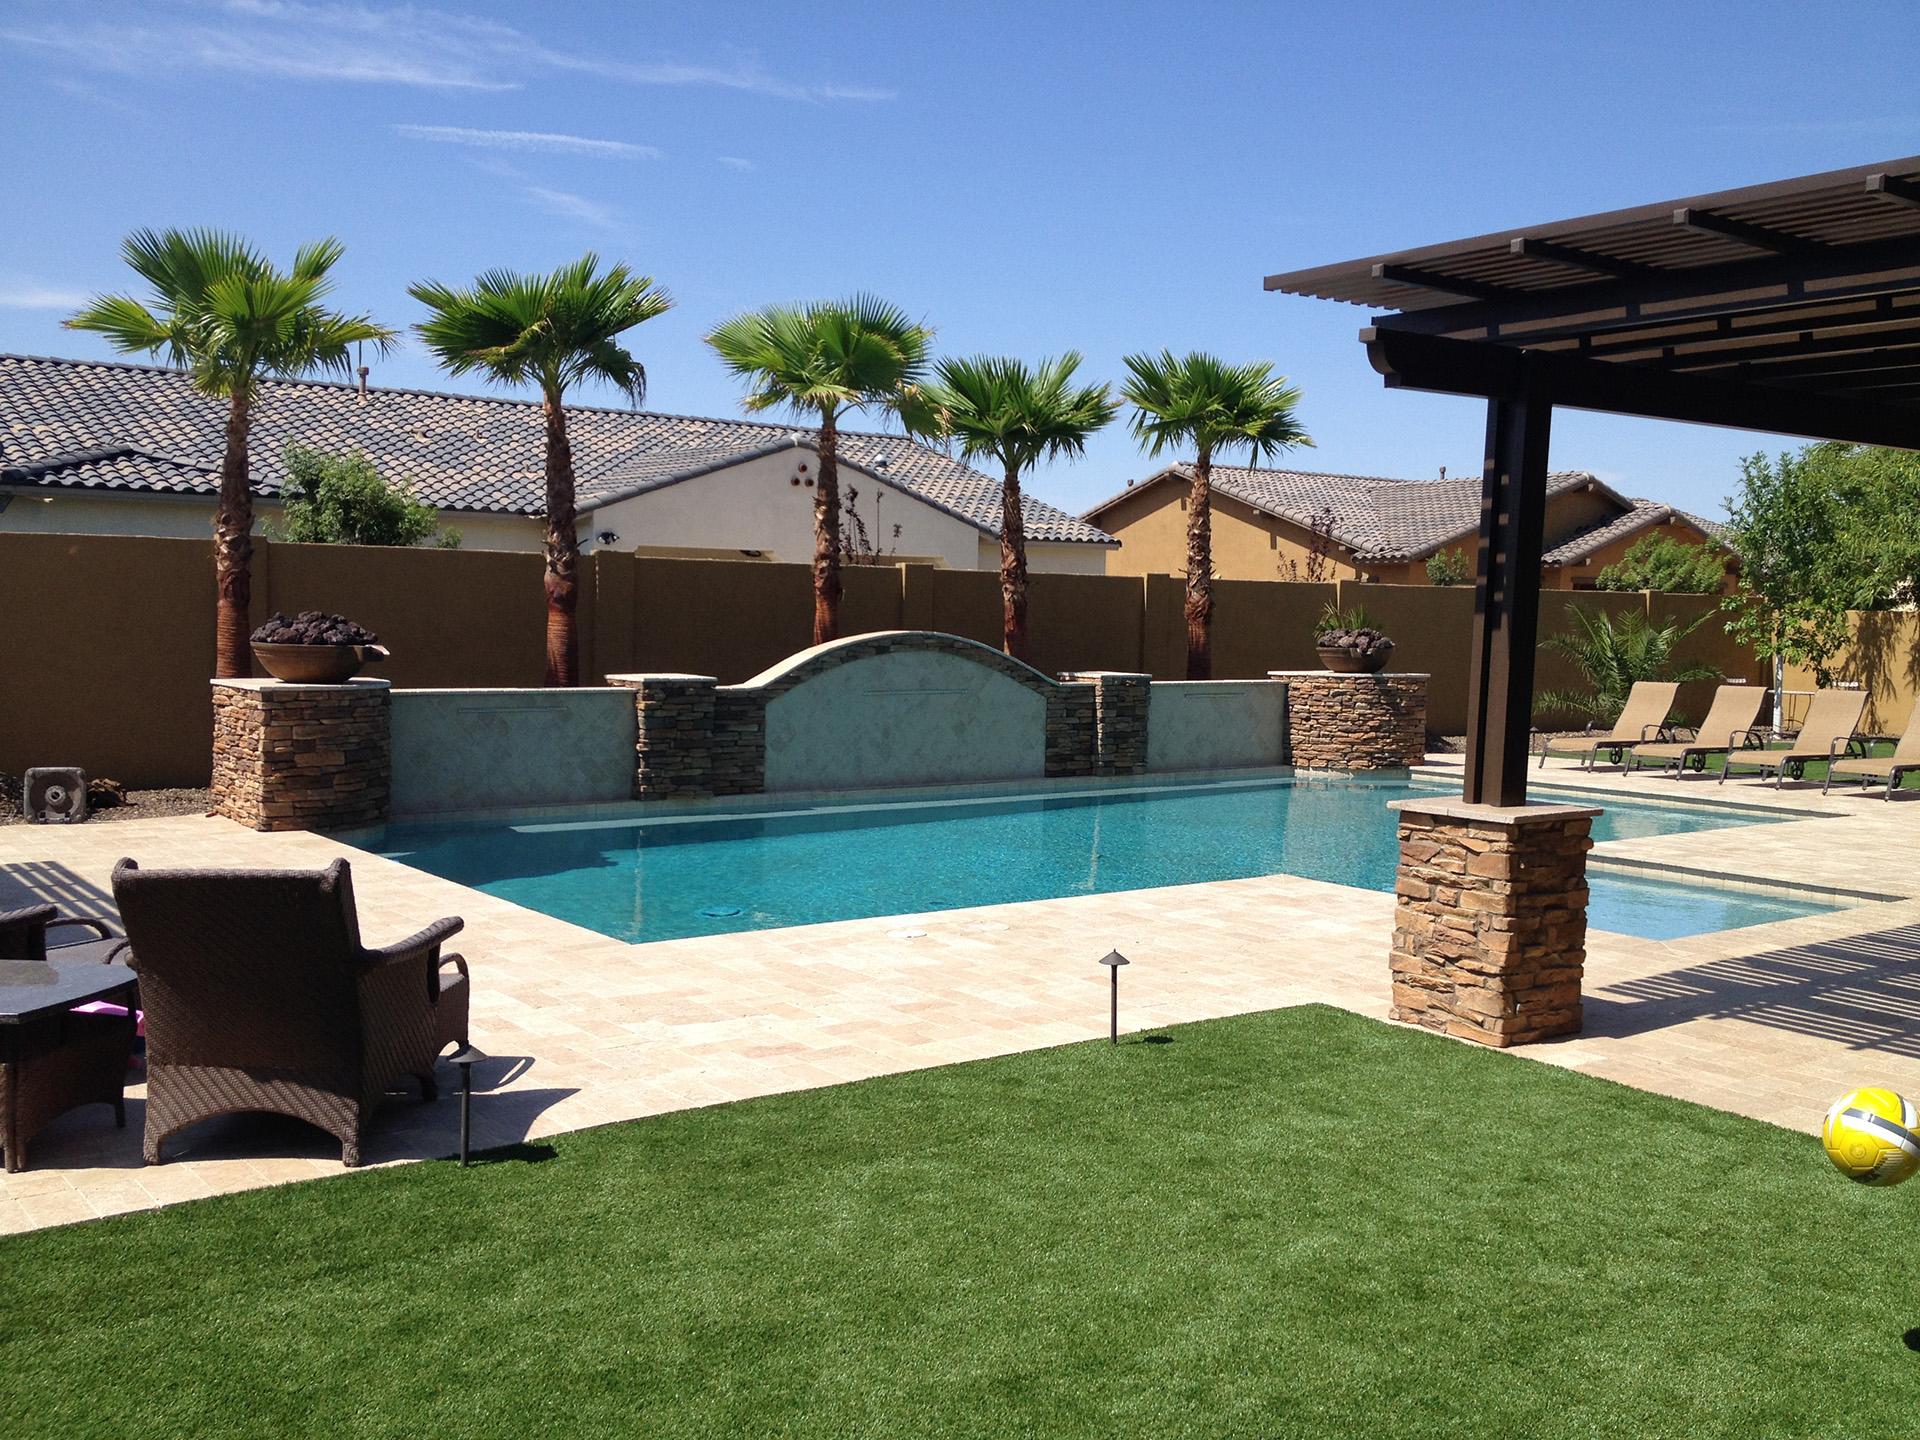 No Limit Pools & Spas image 58